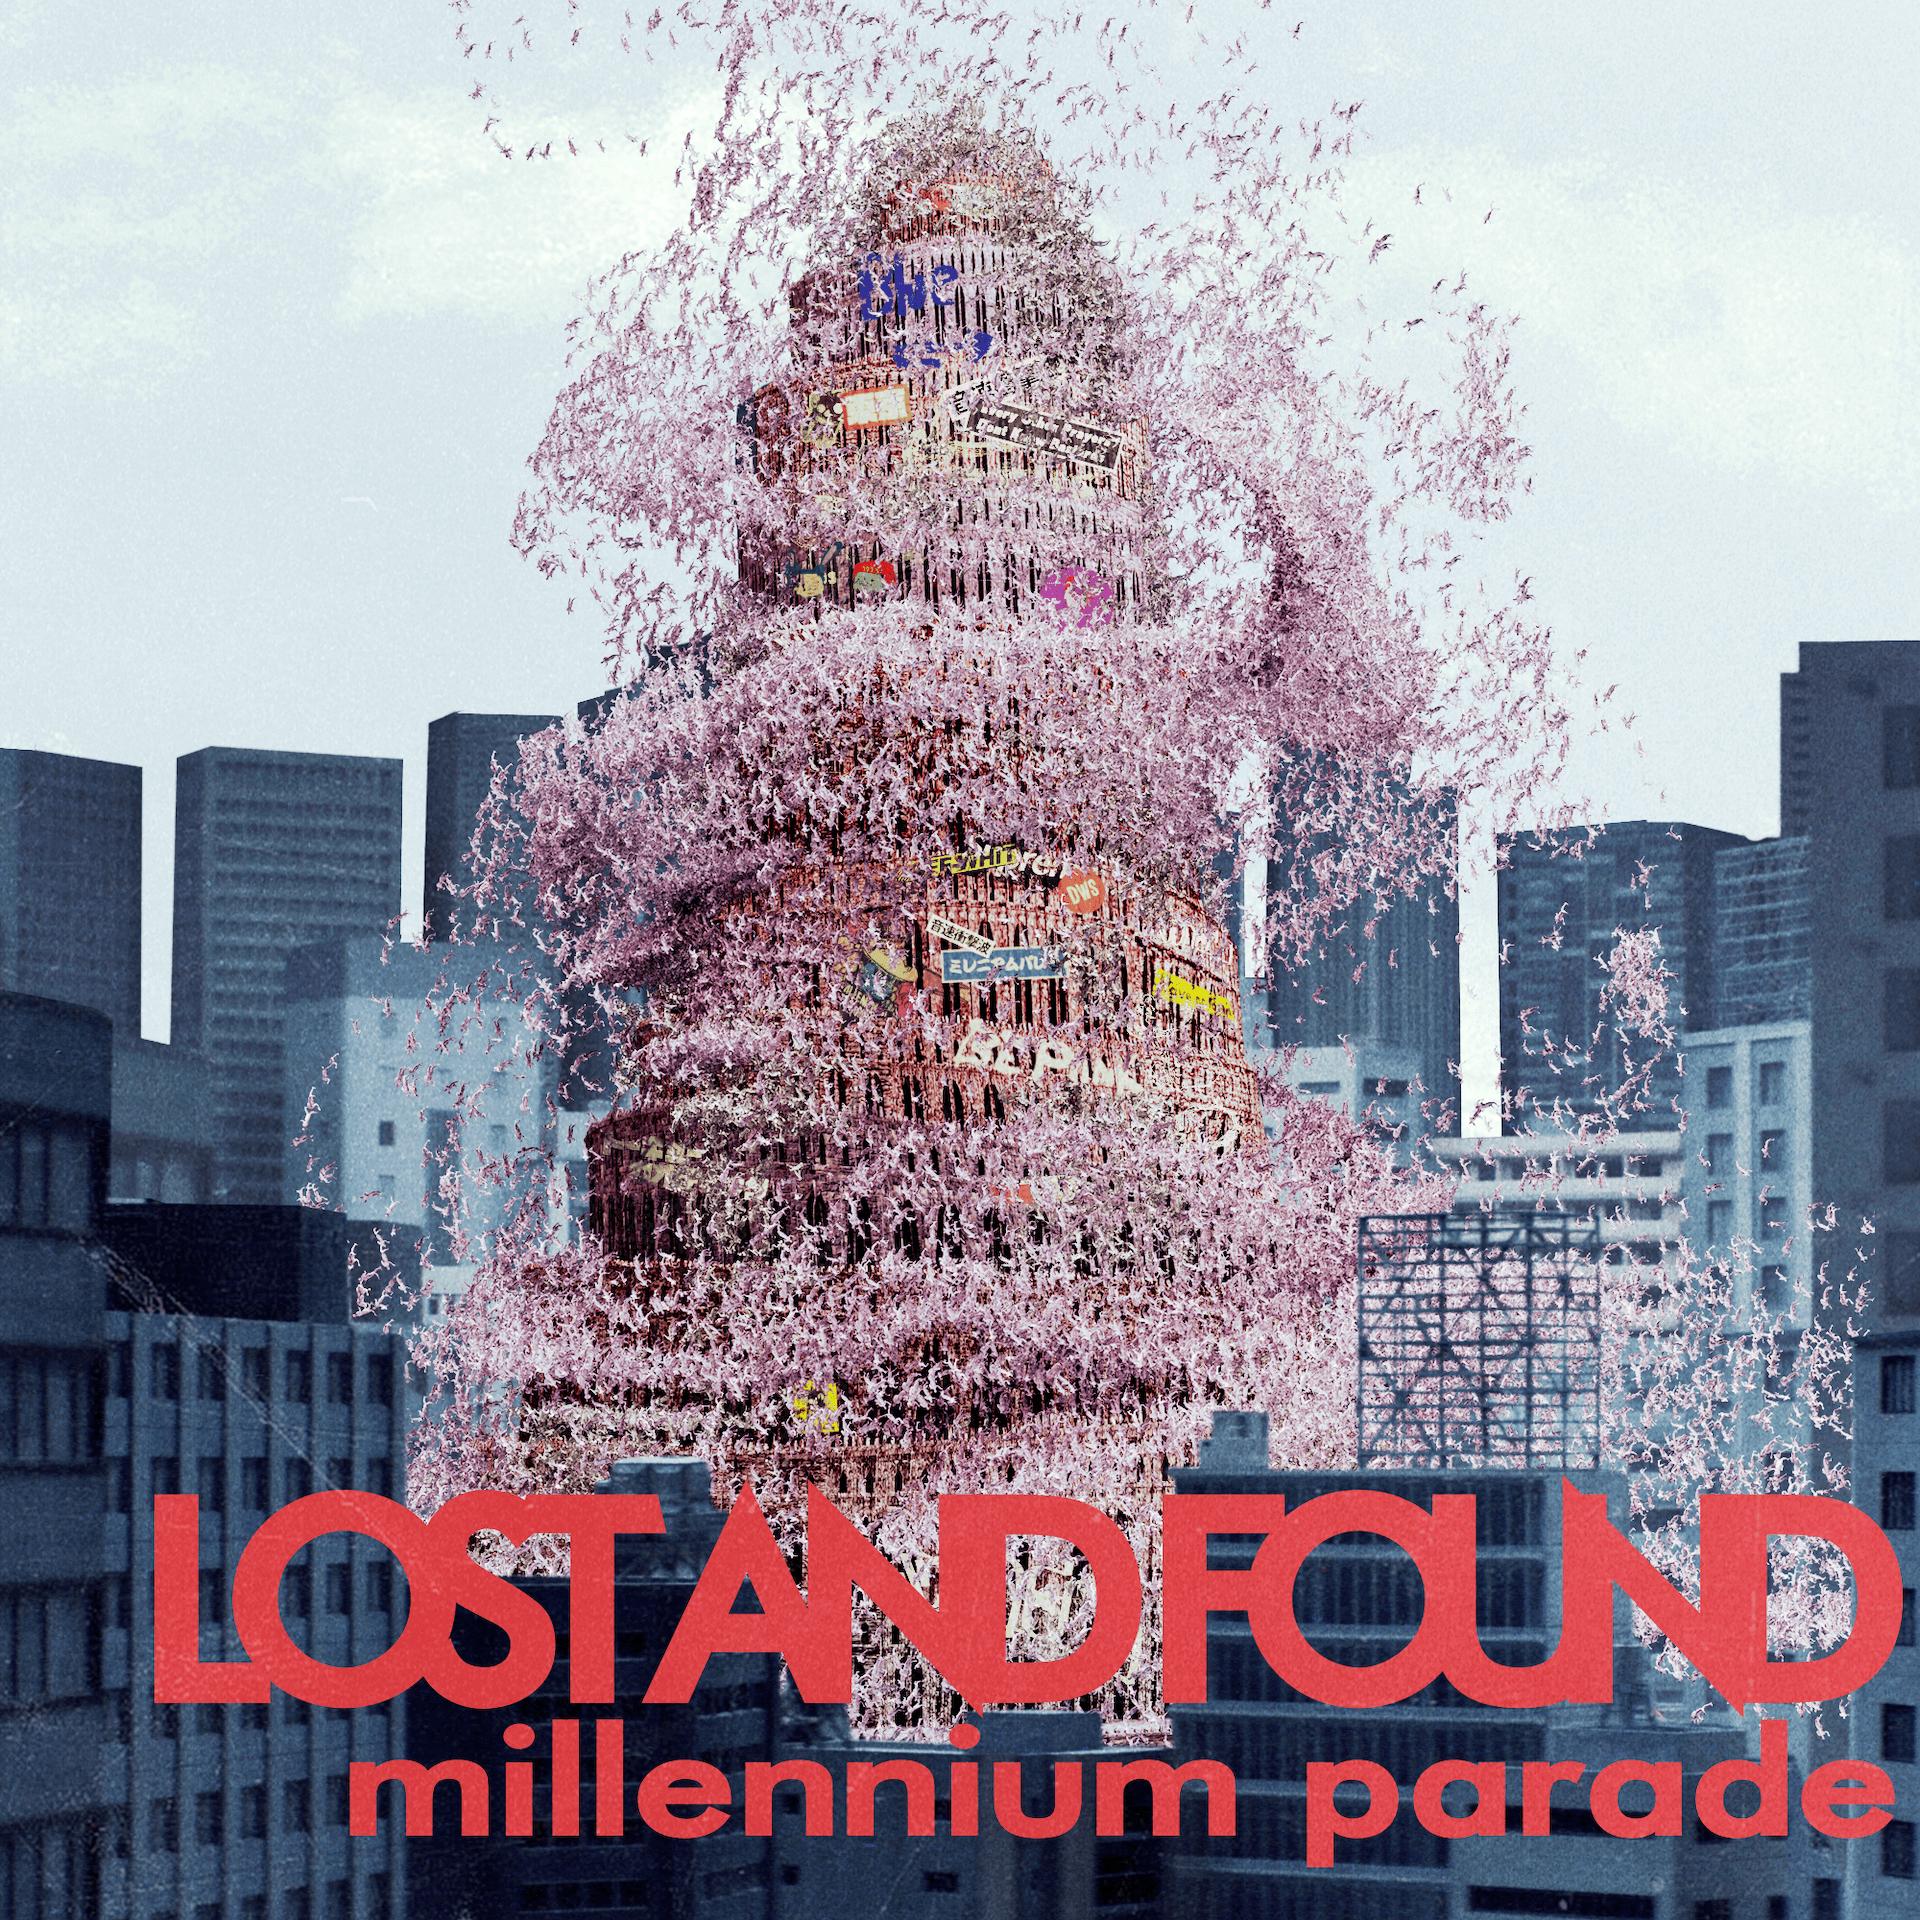 King Gnu常田大希率いるmillennium parade、Diorとのコラボで話題の新曲「lost and found」を配信スタート!MVも解禁 music191207_millennium-parade_10-1920x1920